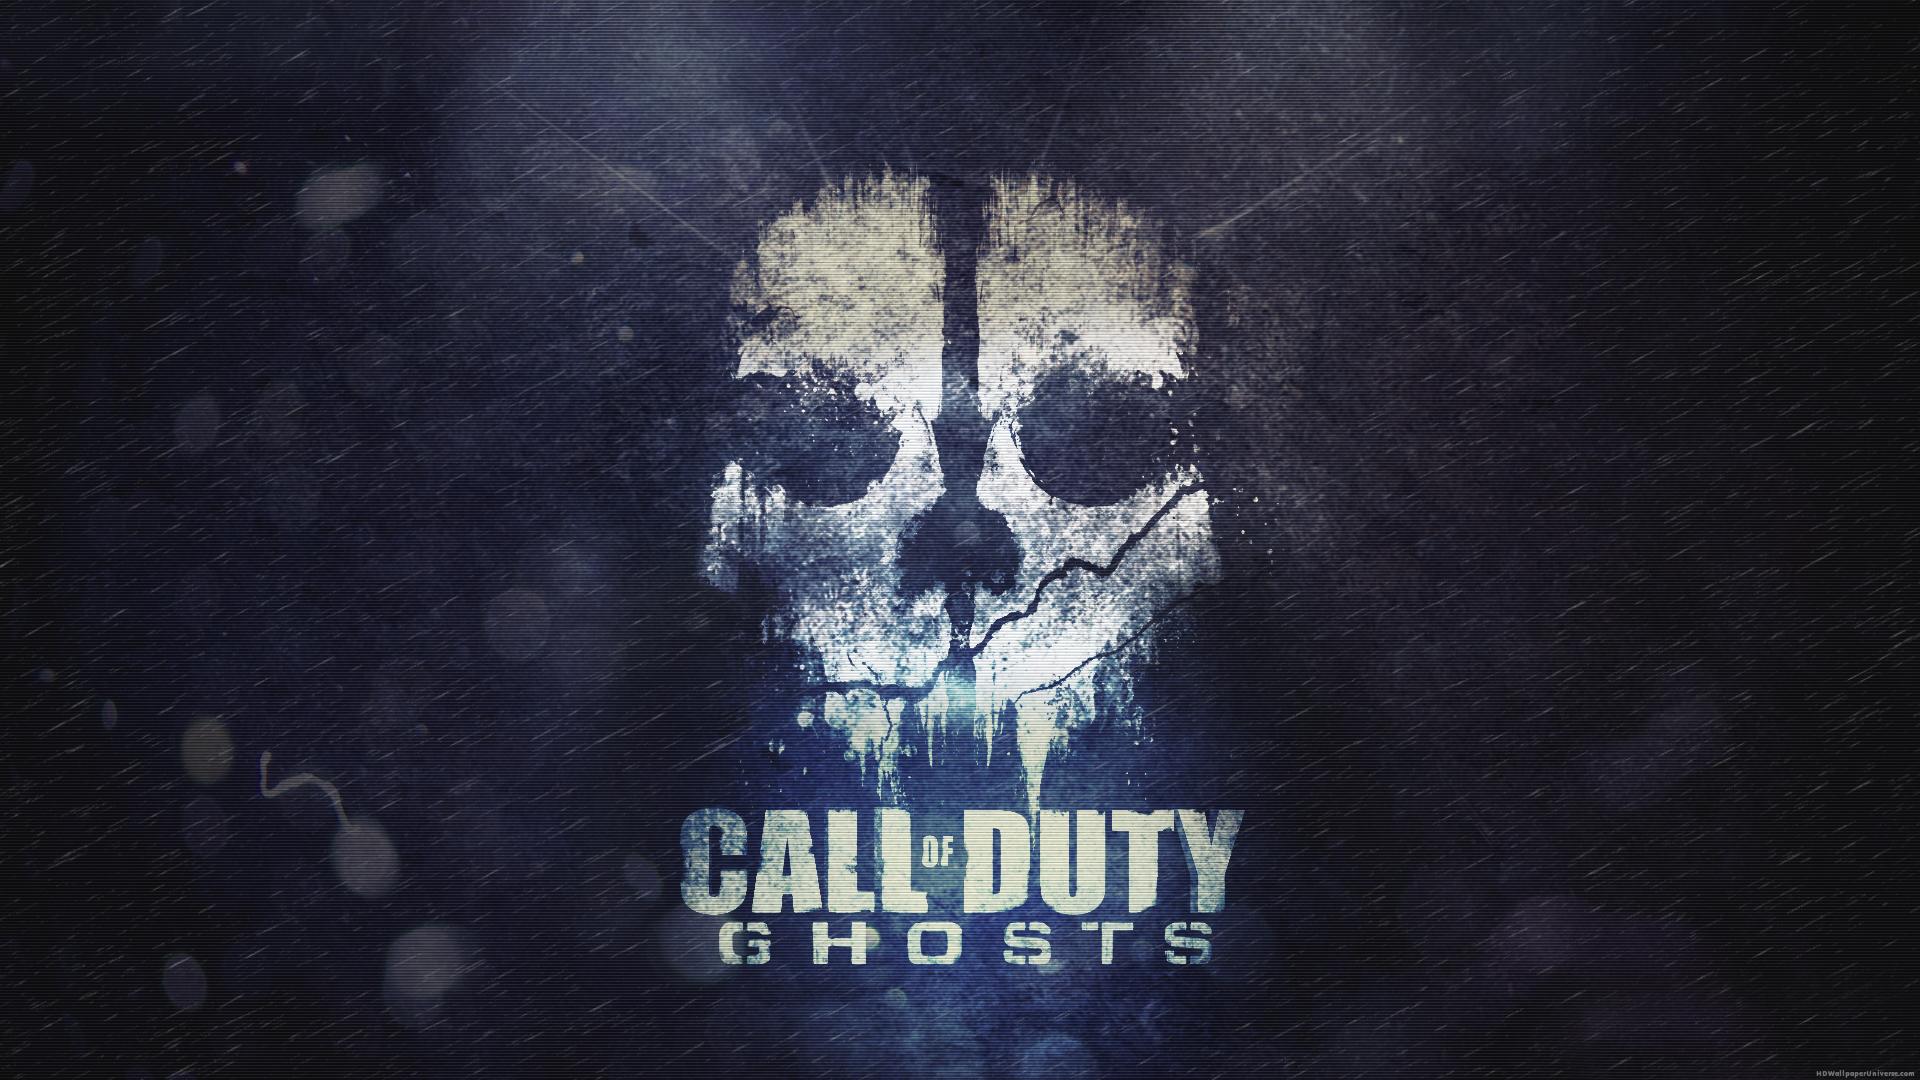 Call Of Duty Ghosts Logo Hd Wallpaper Http Www Hdwallpaperuniverse Com Call Duty Ghosts Logo Hd Wall Call Of Duty Call Of Duty Ghosts Call Of Duty Infinite